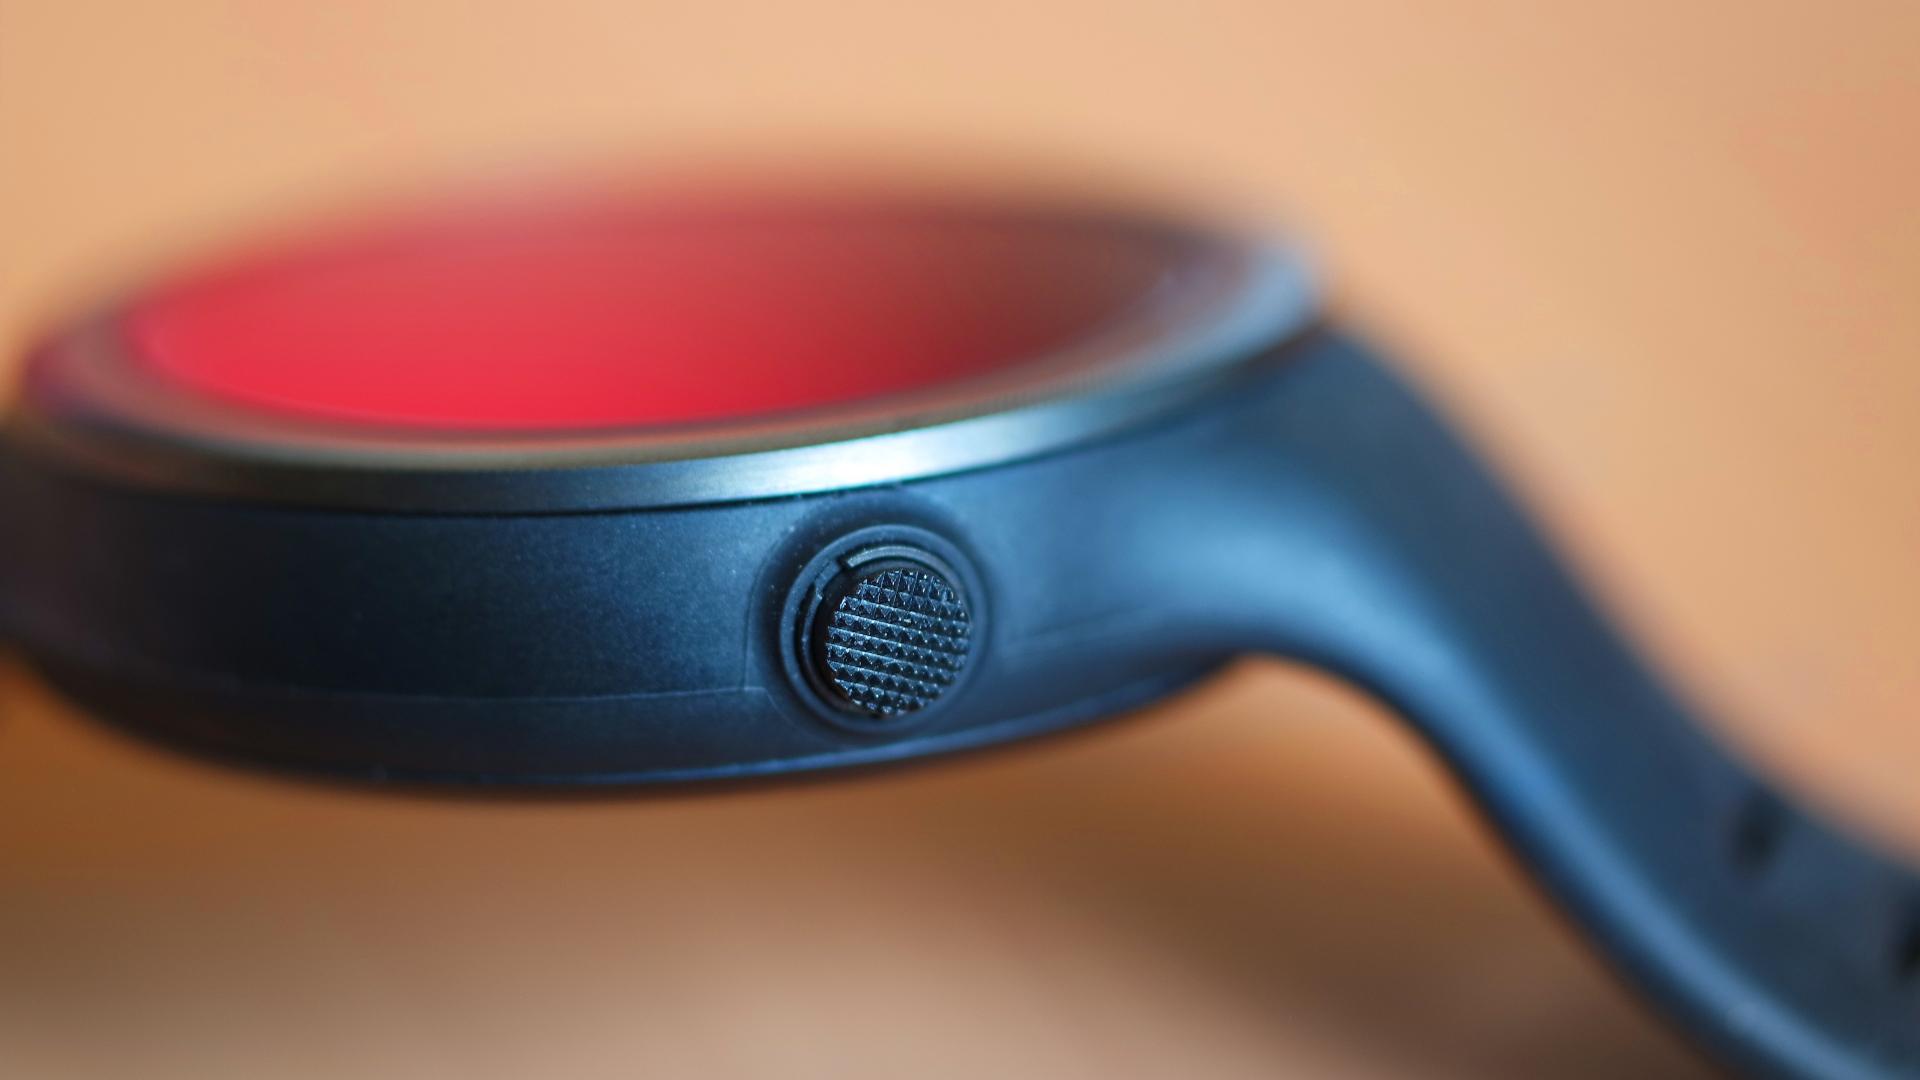 Botón hardware del Motorola Moto 360 Sport